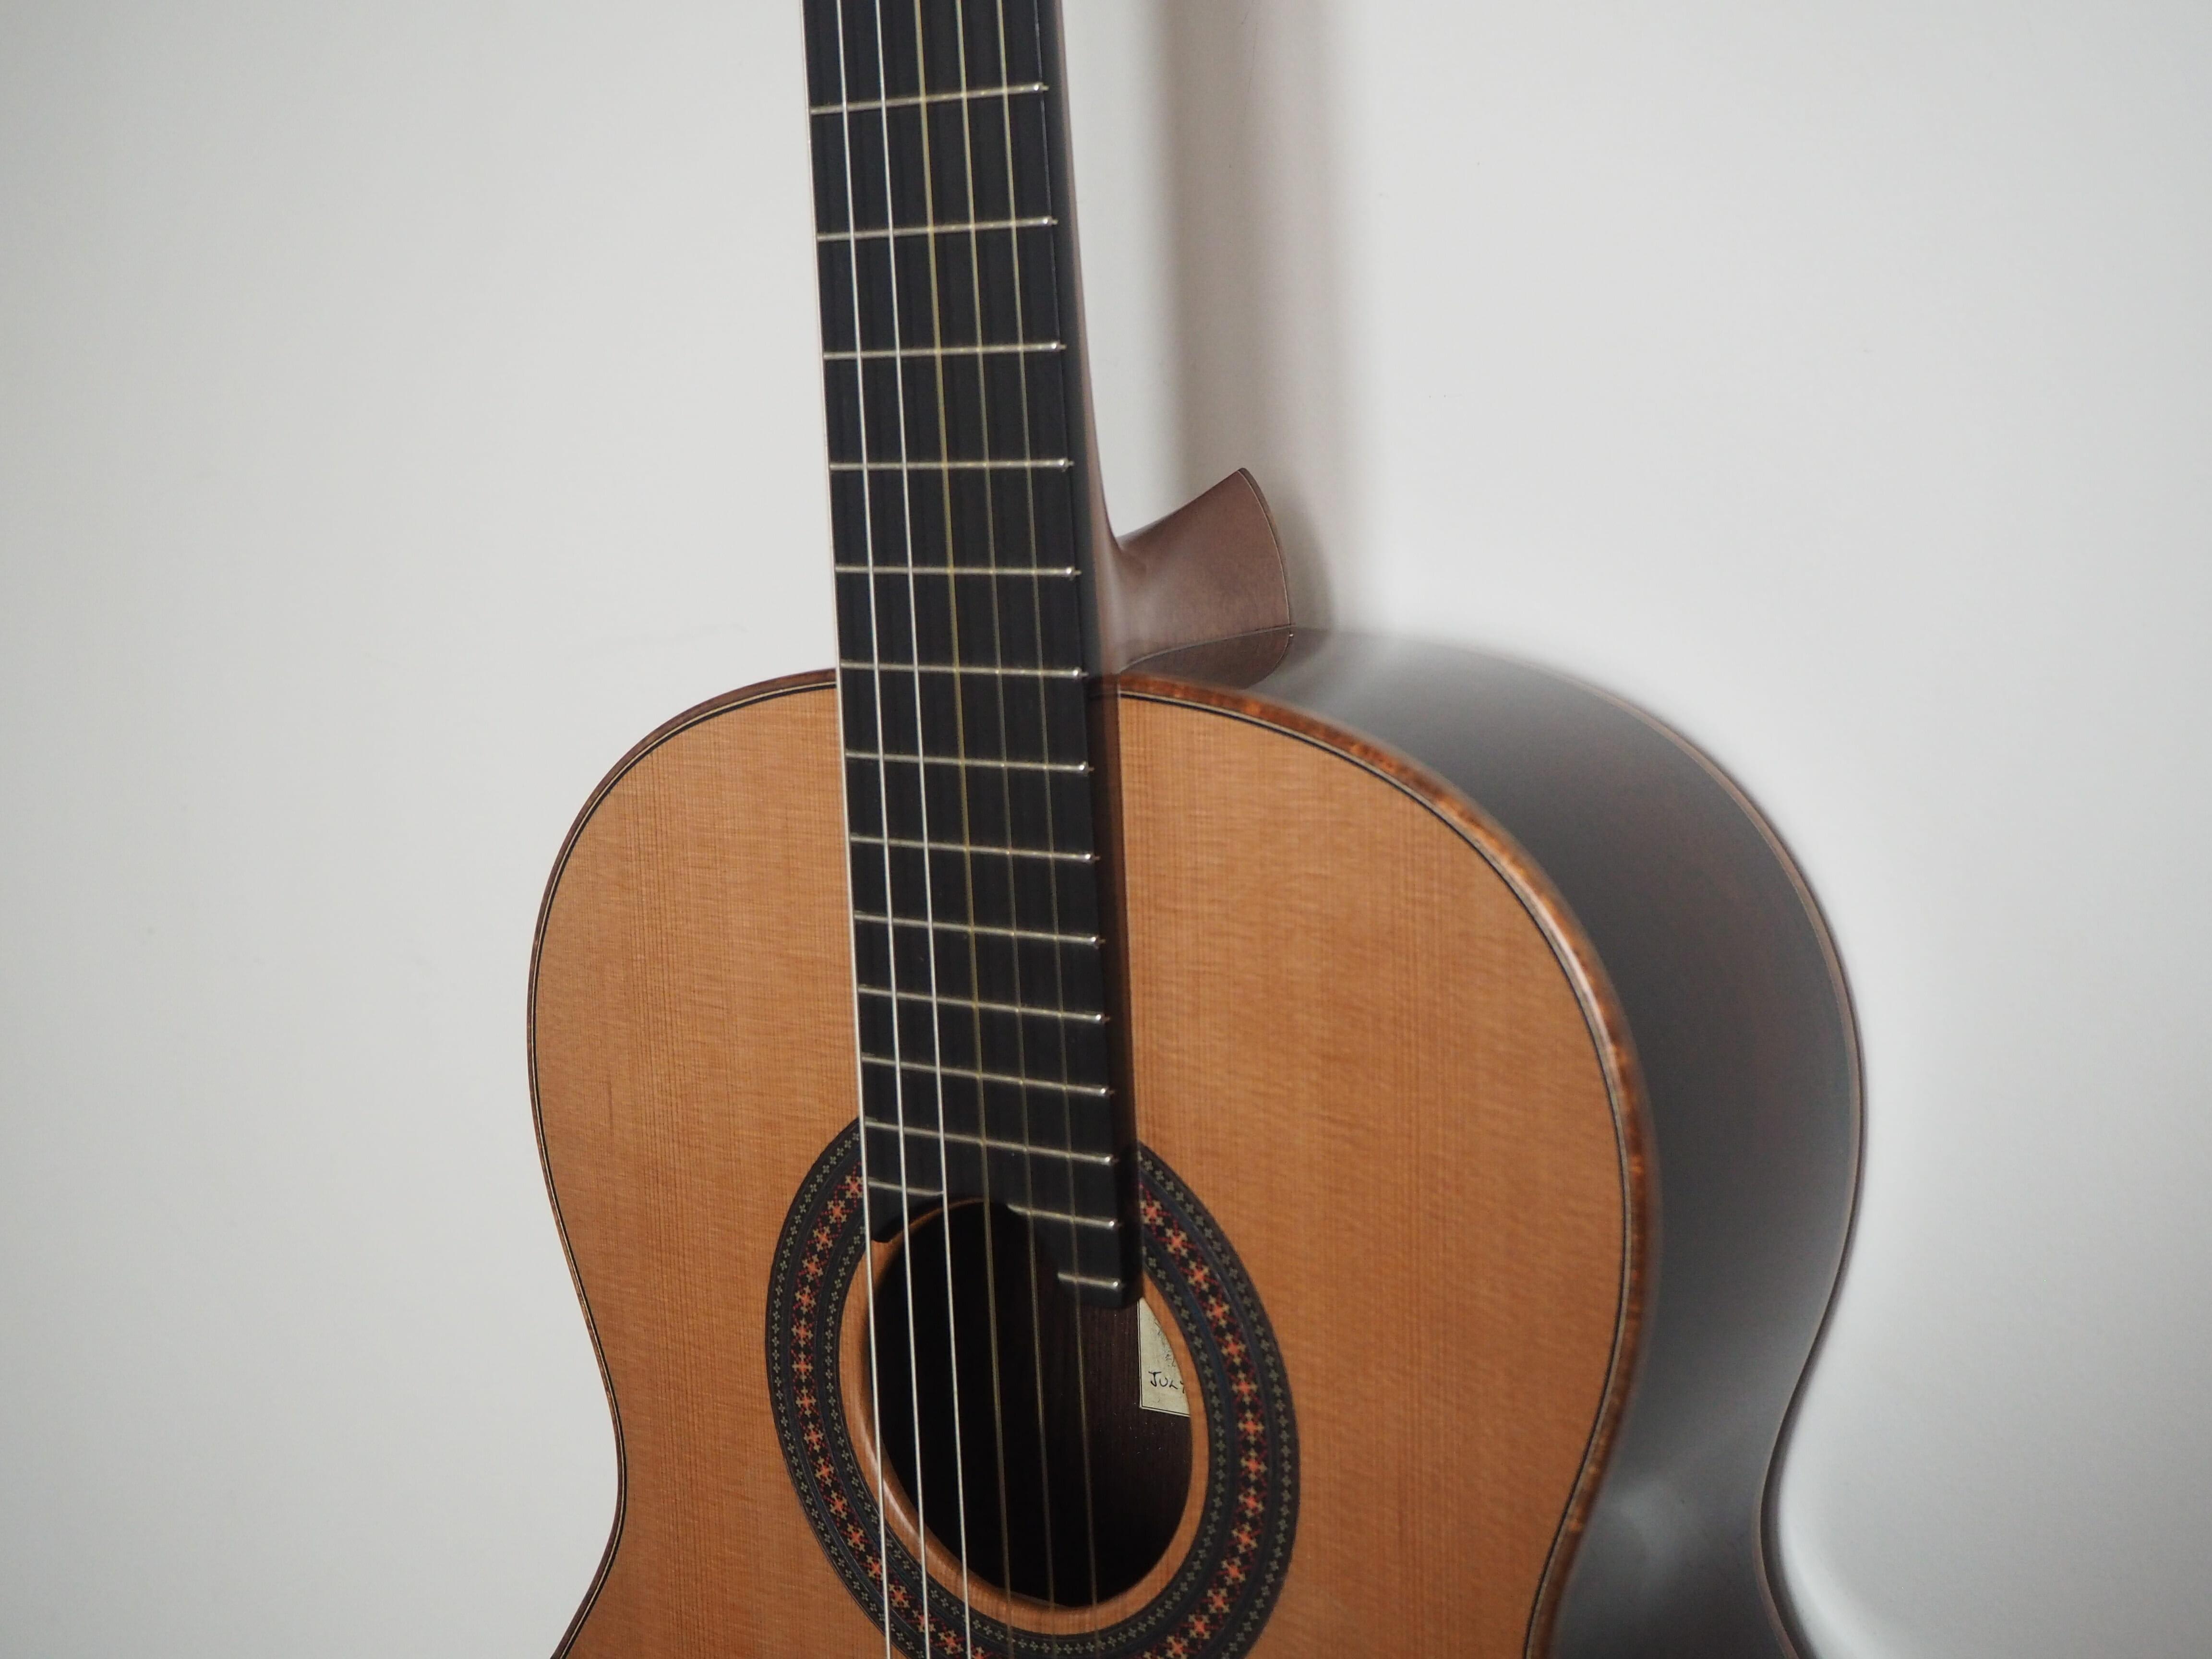 robin moyes classical guitar cedar top 2015 australia classical concert guitar. Black Bedroom Furniture Sets. Home Design Ideas